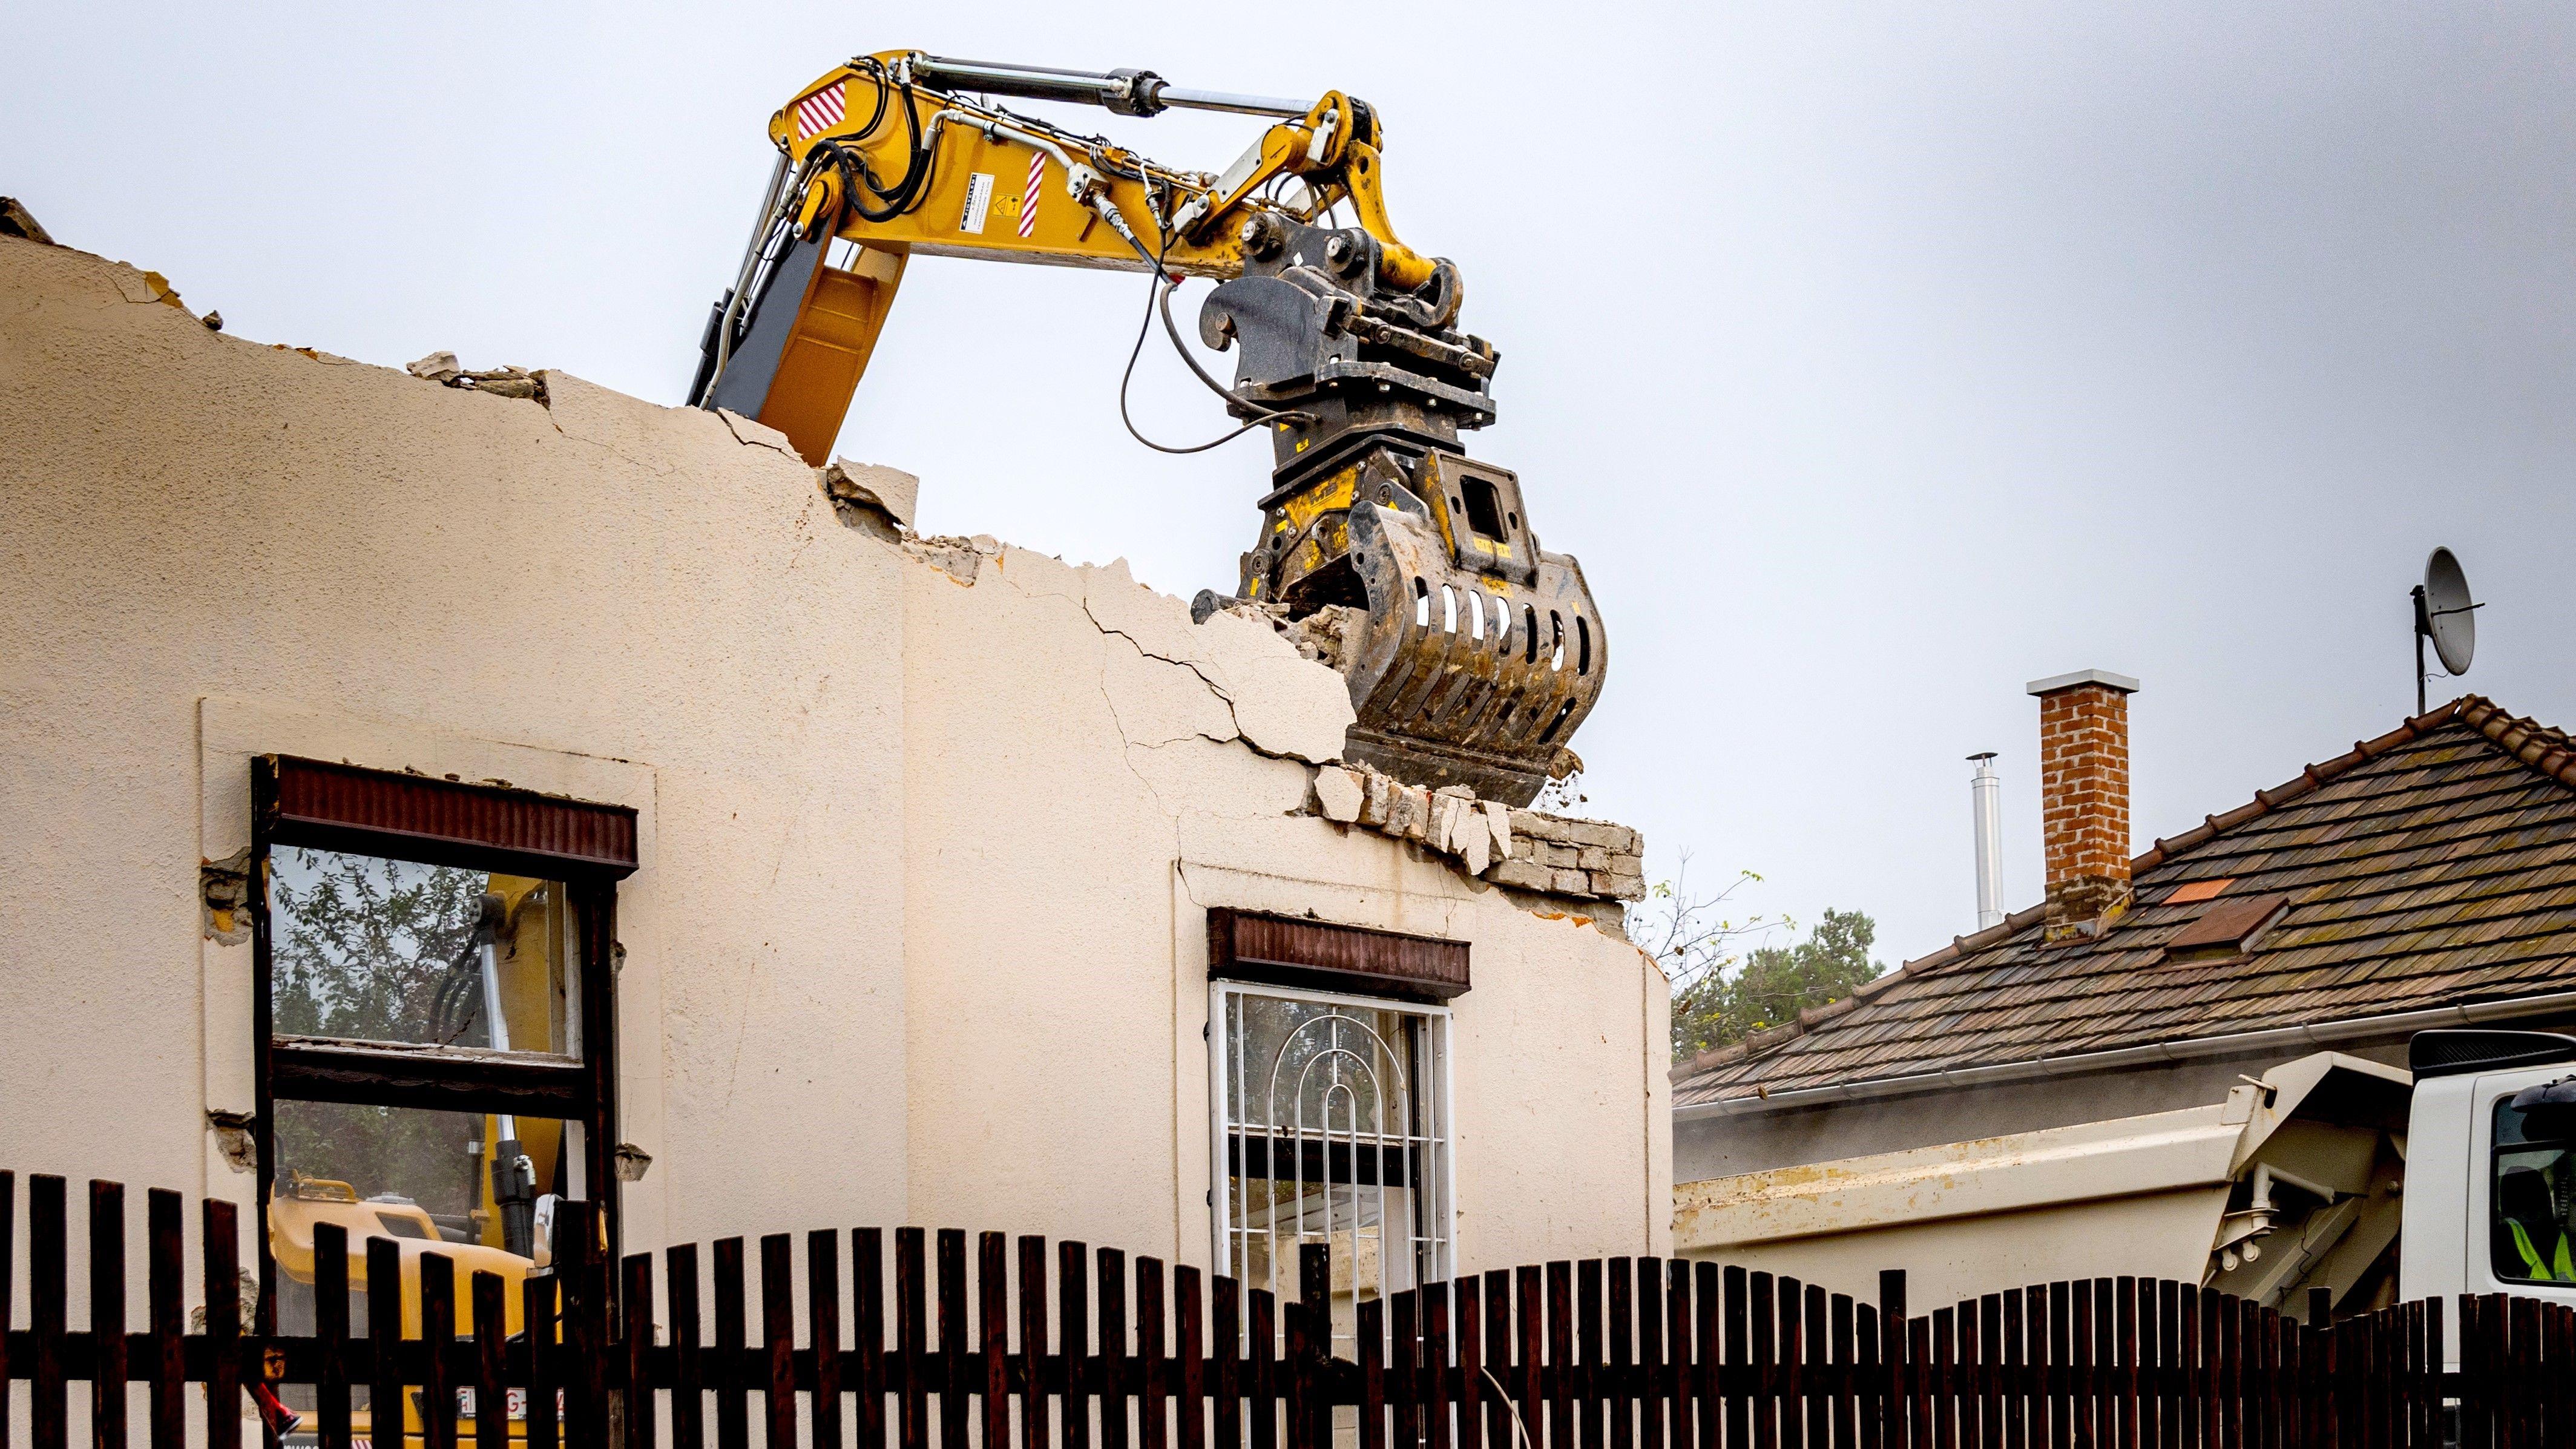 541_Foto 3_MB-G900 - Caterpillar M314 F - Hungary- House demolition- demolition_1609864056